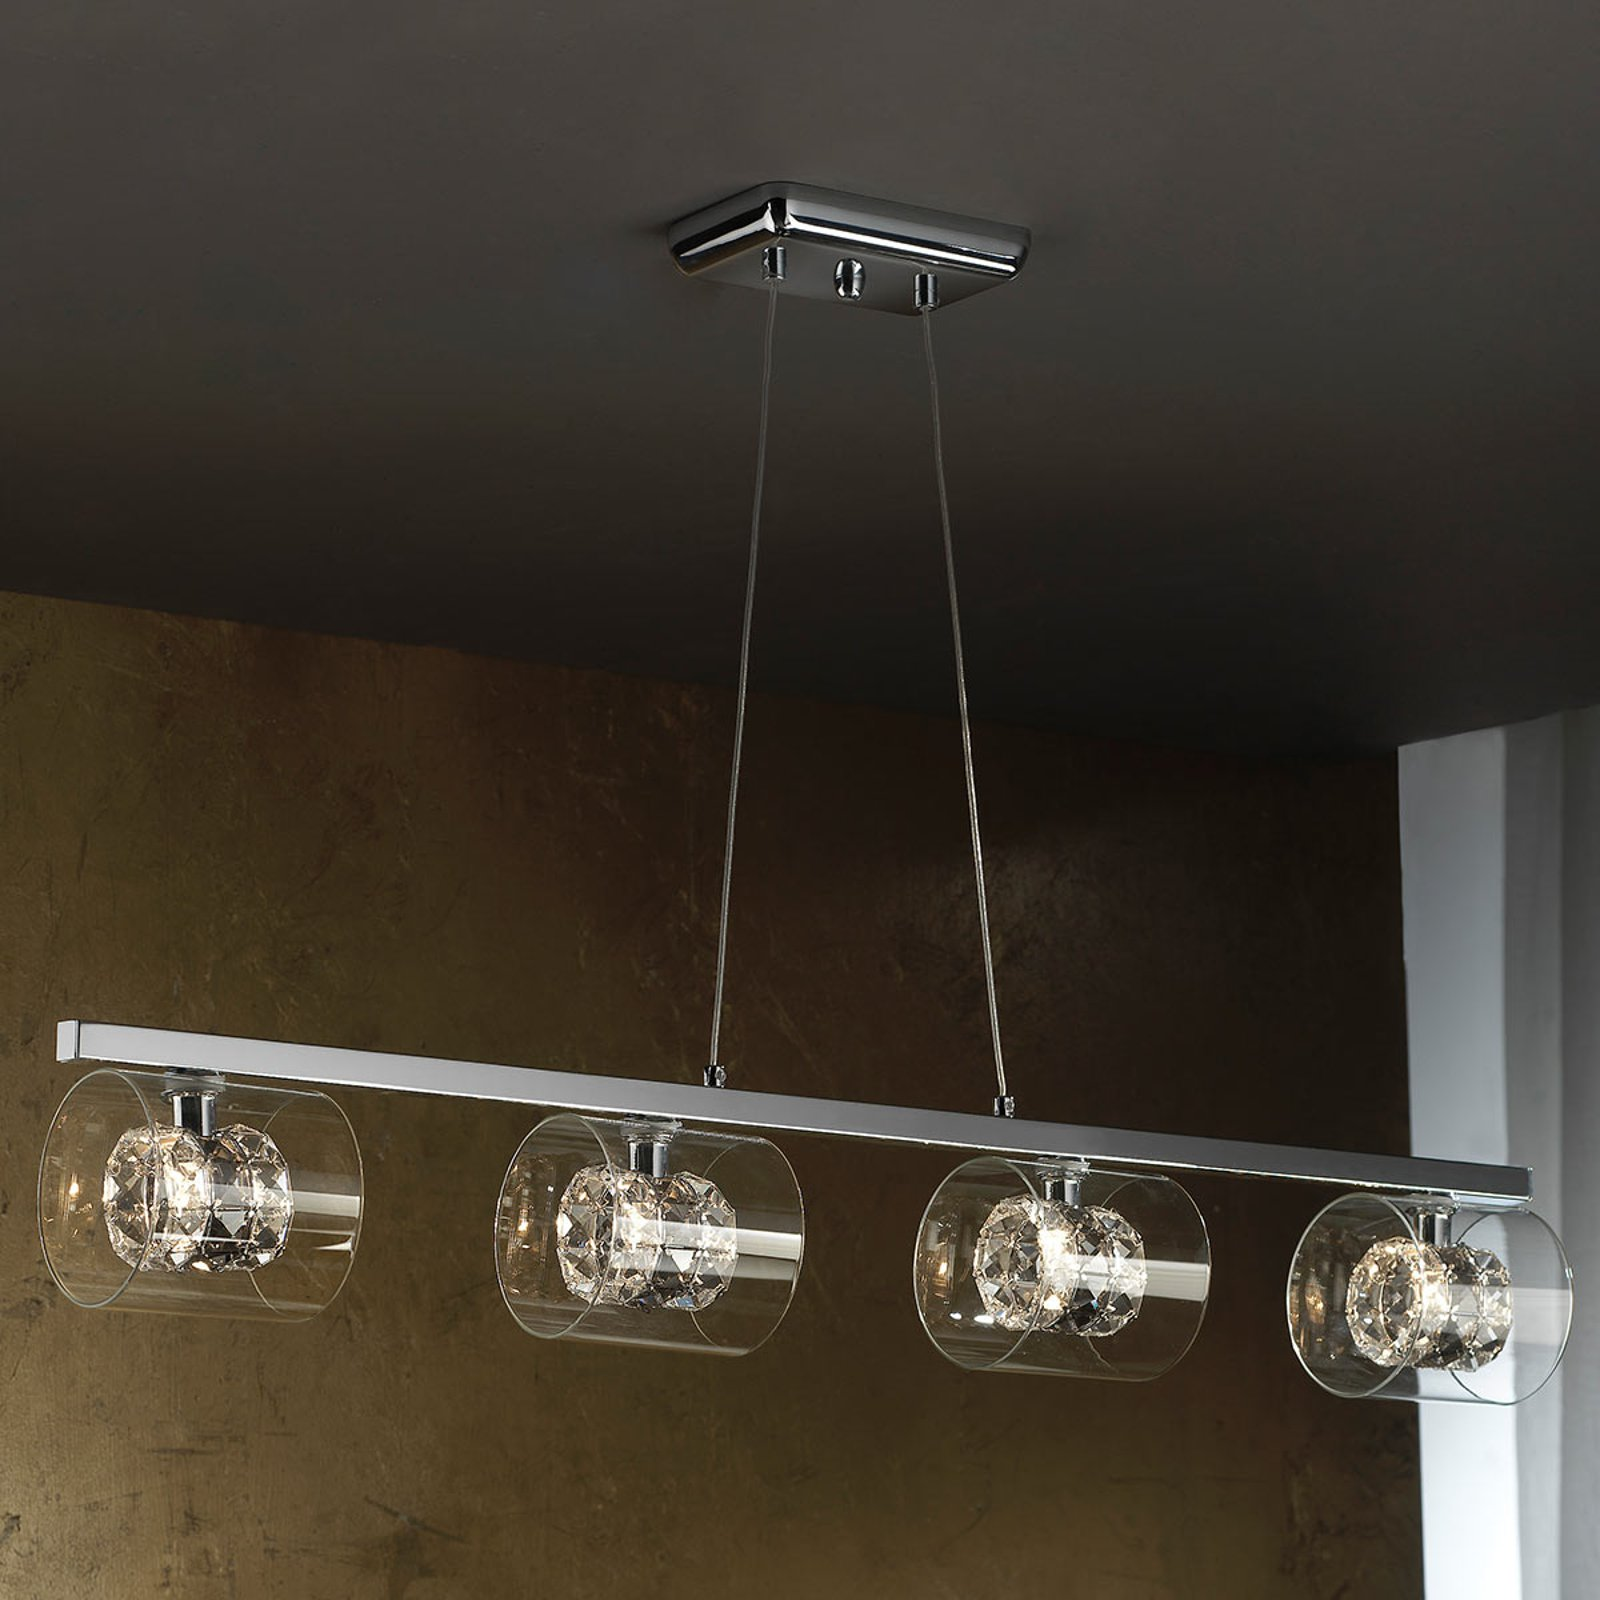 LED-pendellampe Flash med krystallringer